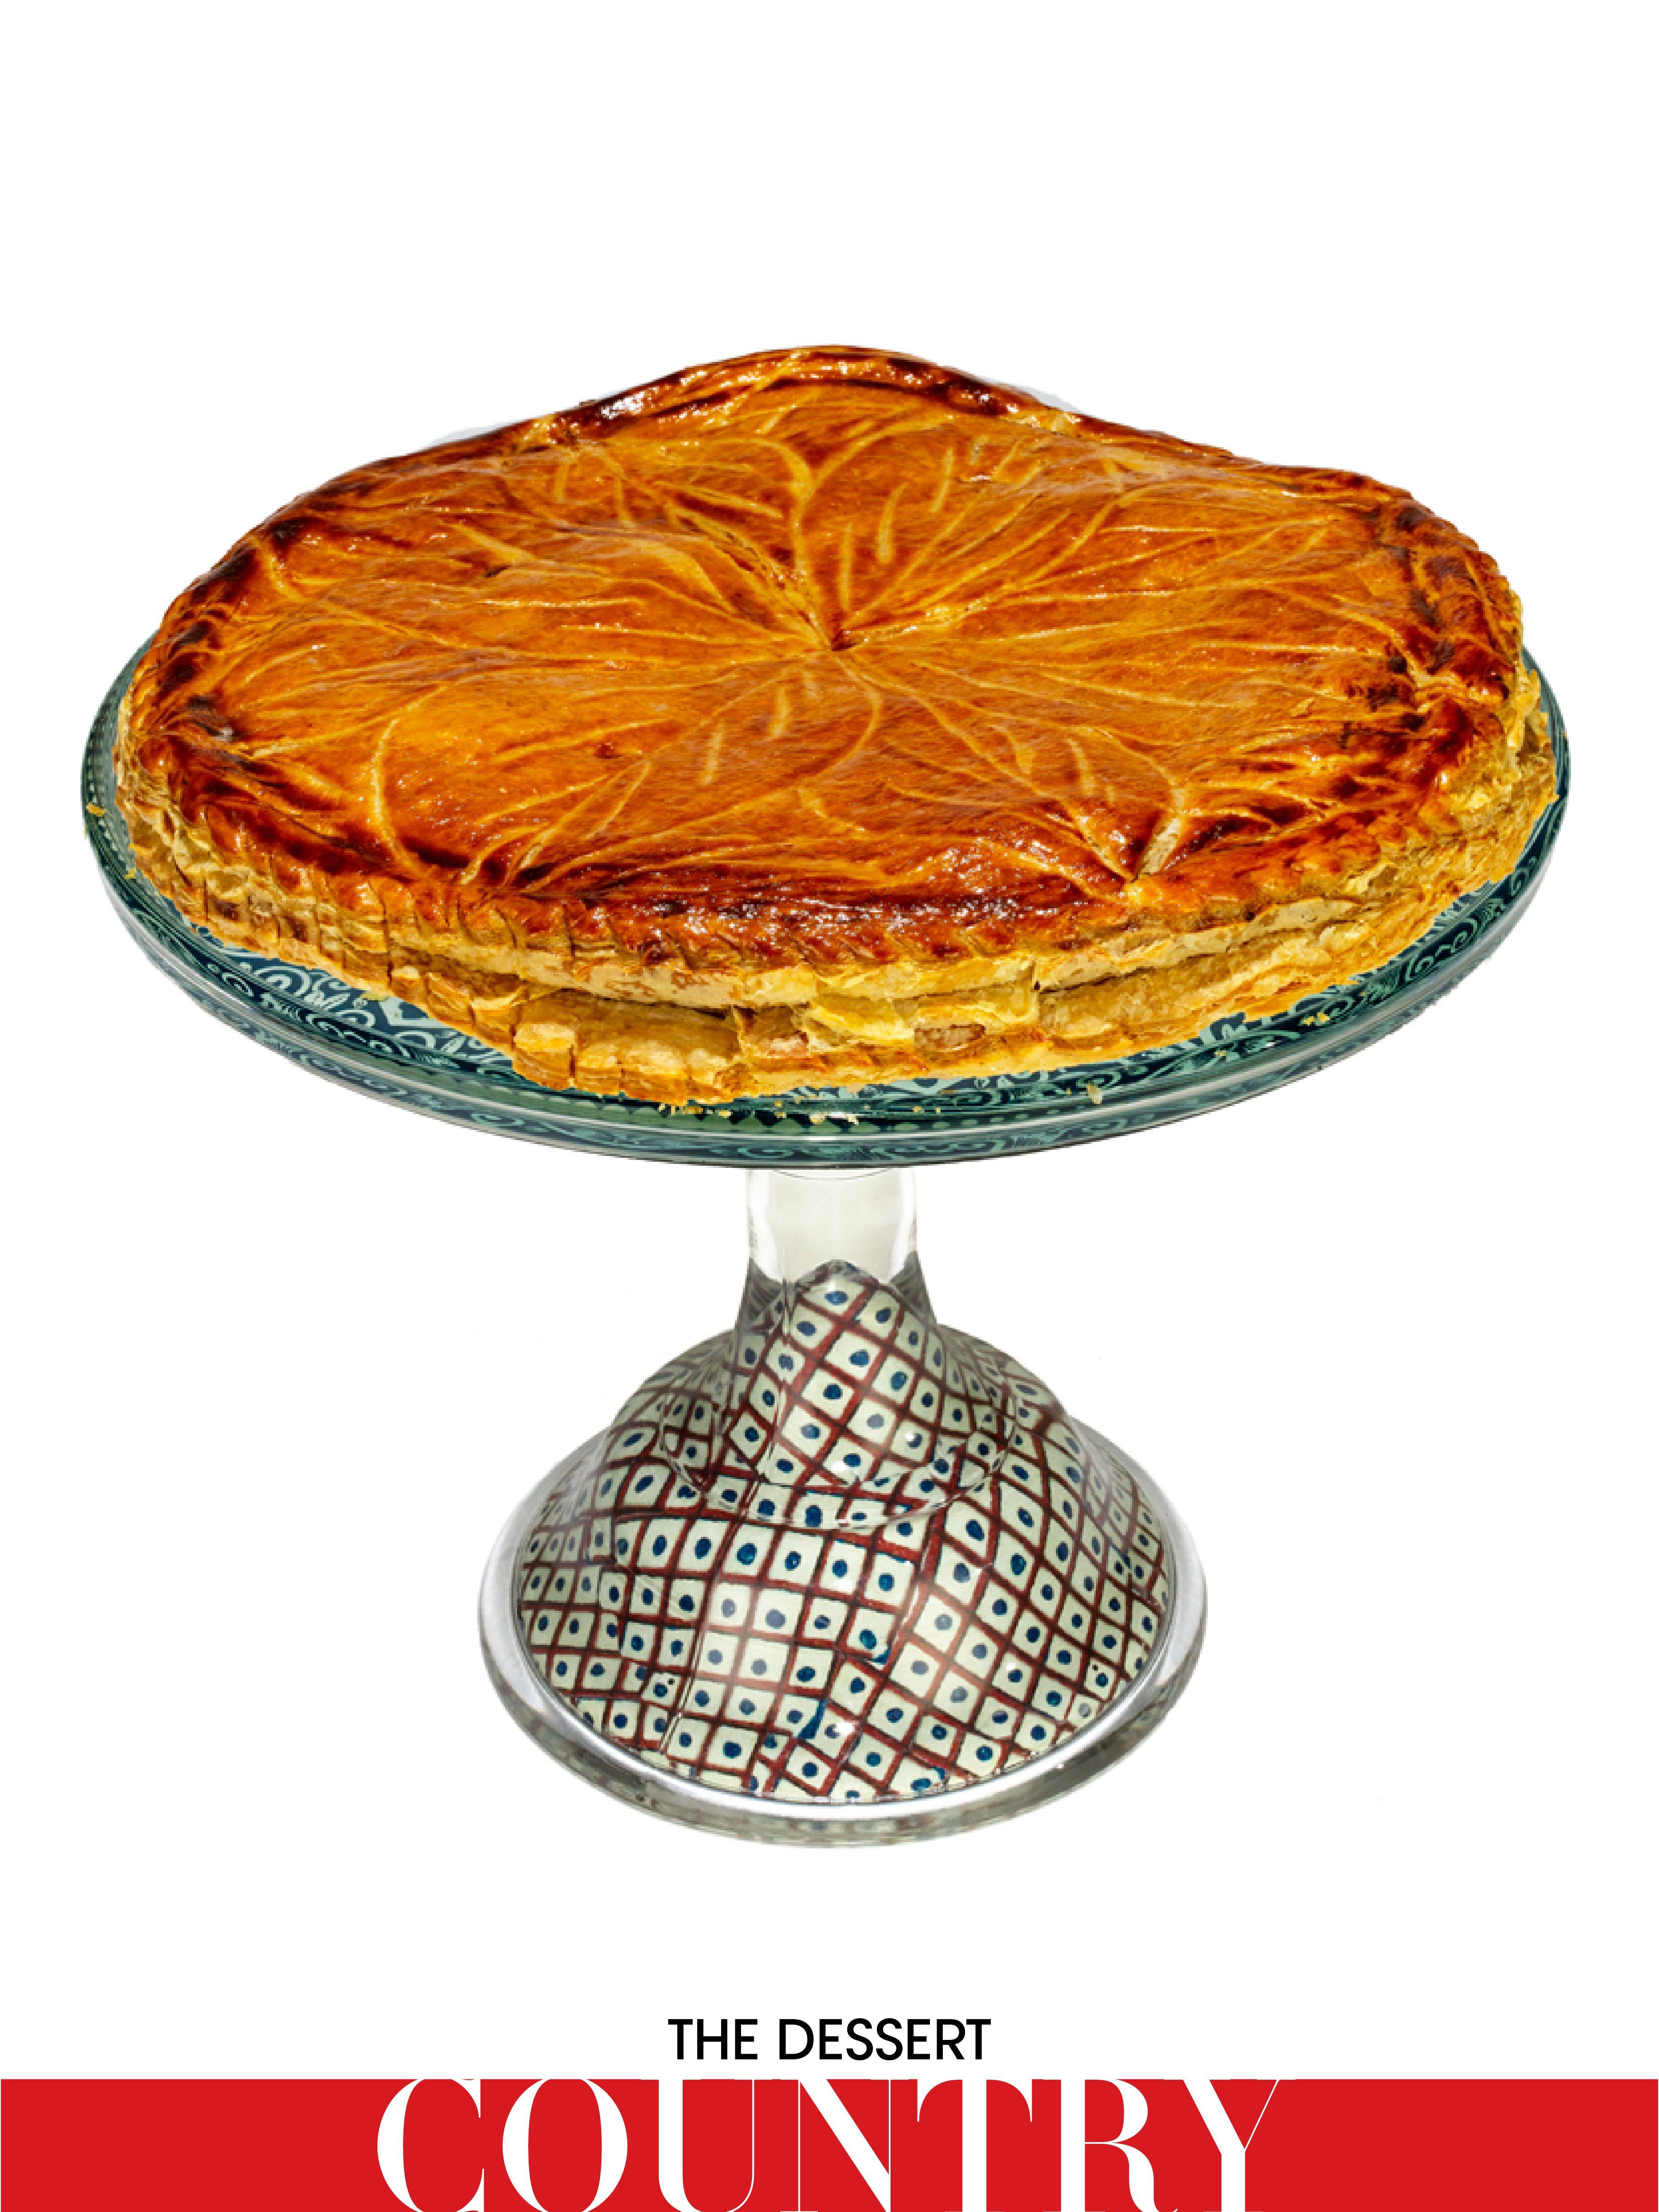 Francois Payard Bakery NYC Galette des Rois, from $45payard.com    John Derian Cake Stand, $350John Derian, NYC, 212.677.3917